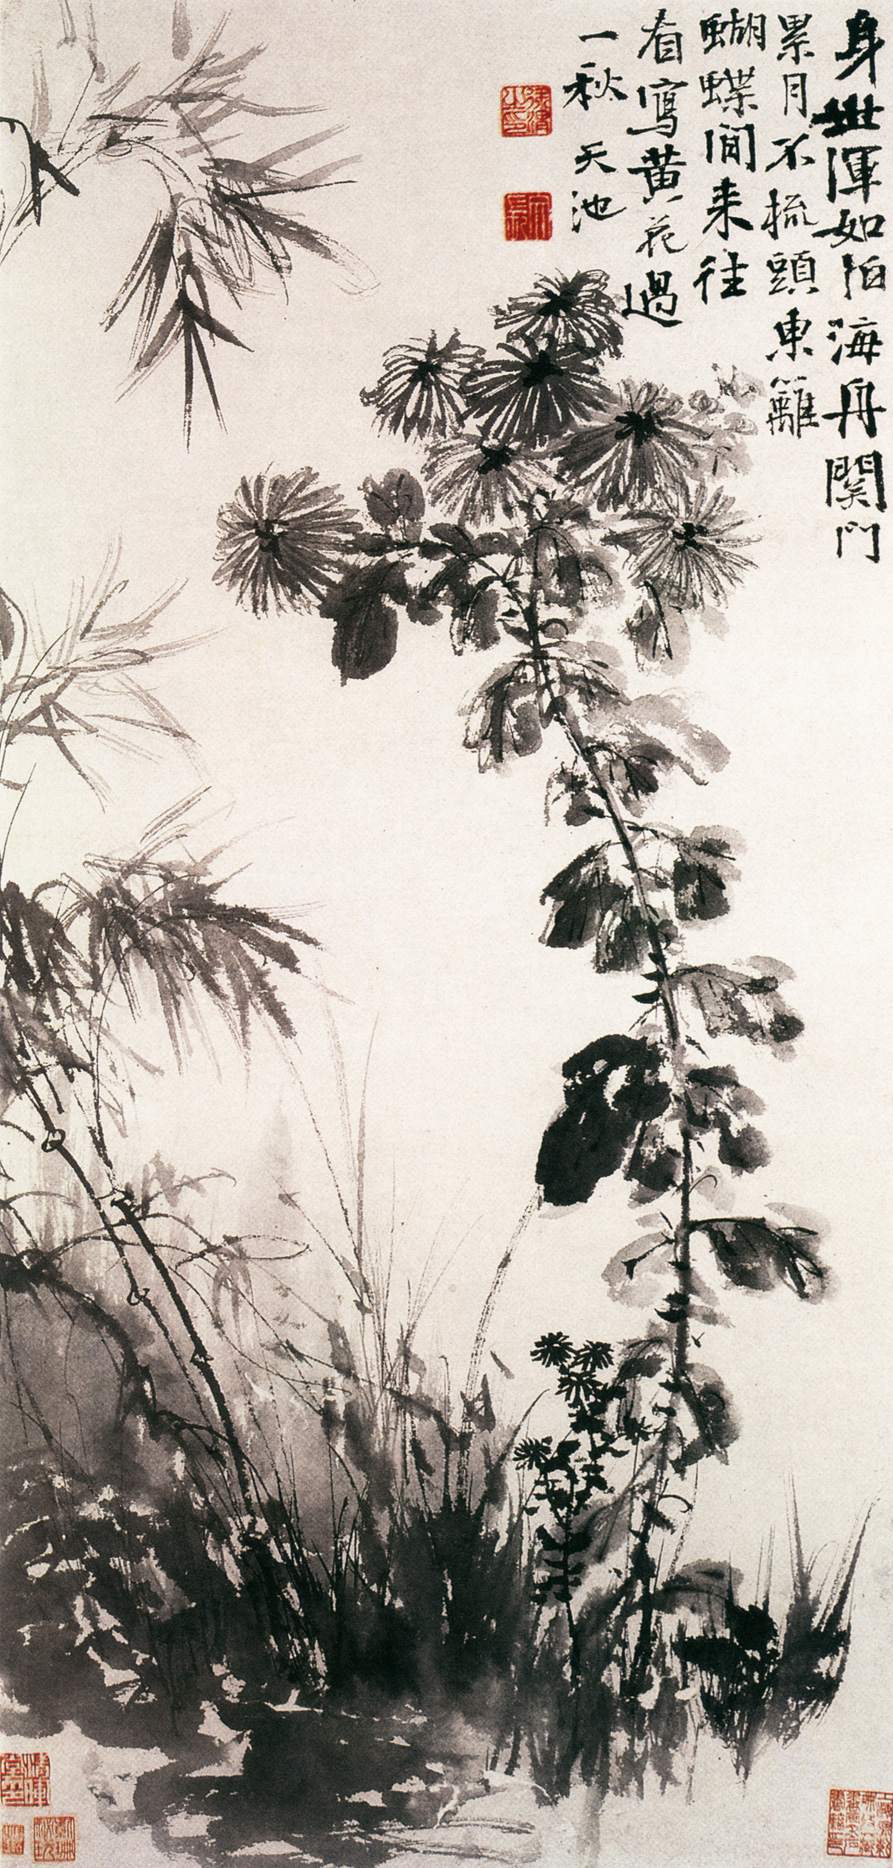 Chrysanthemums_and_Bamboos_by_Xu_Wei.jpg